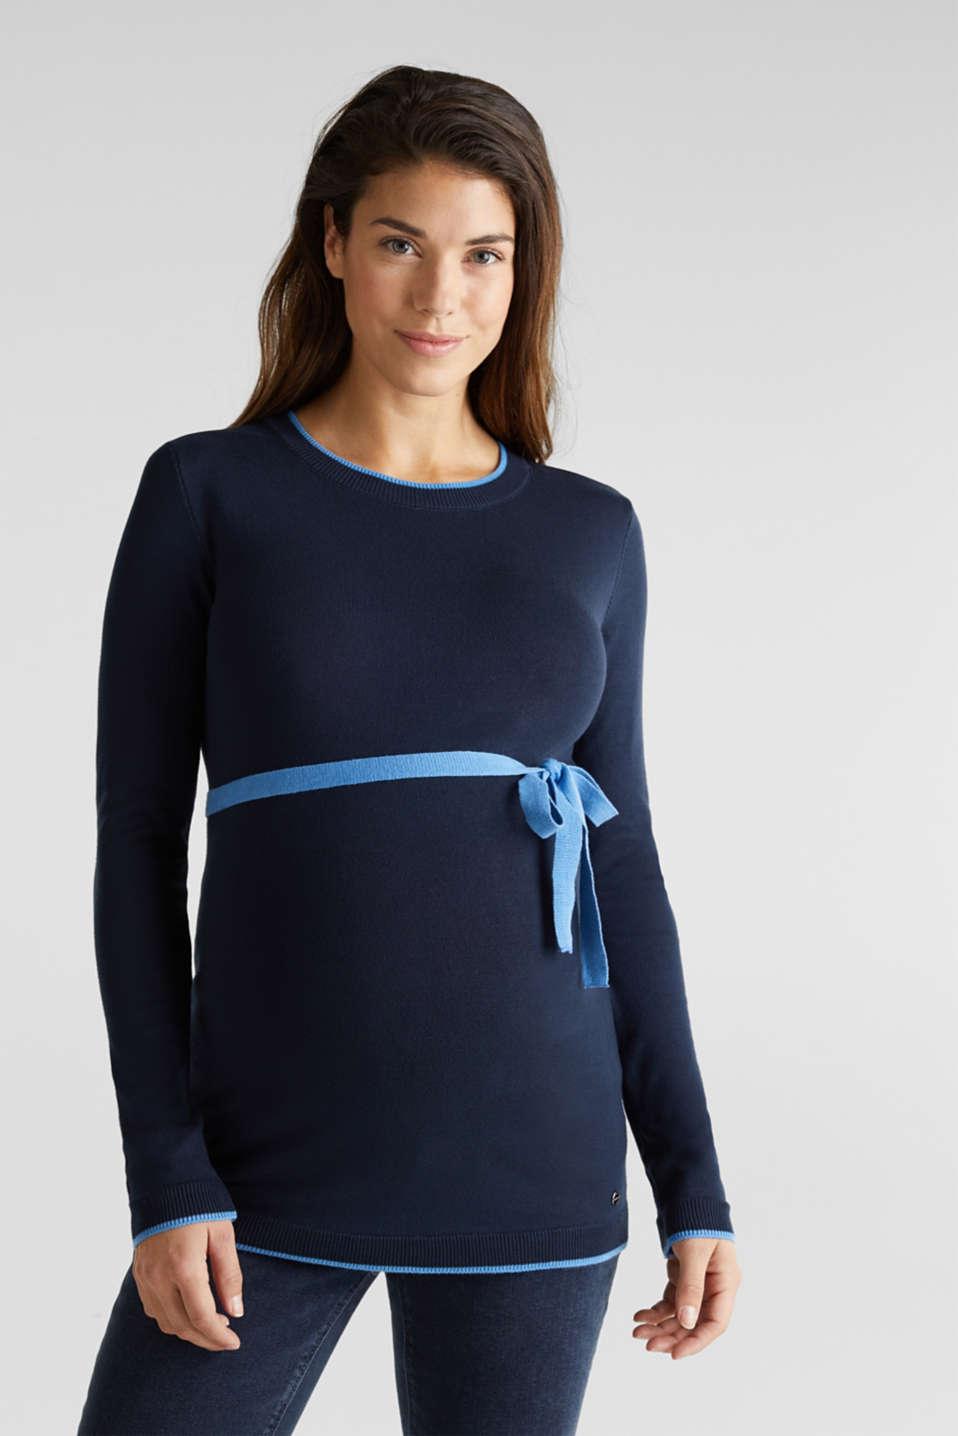 Jumper with contrasting details, LCNIGHT BLUE, detail image number 0